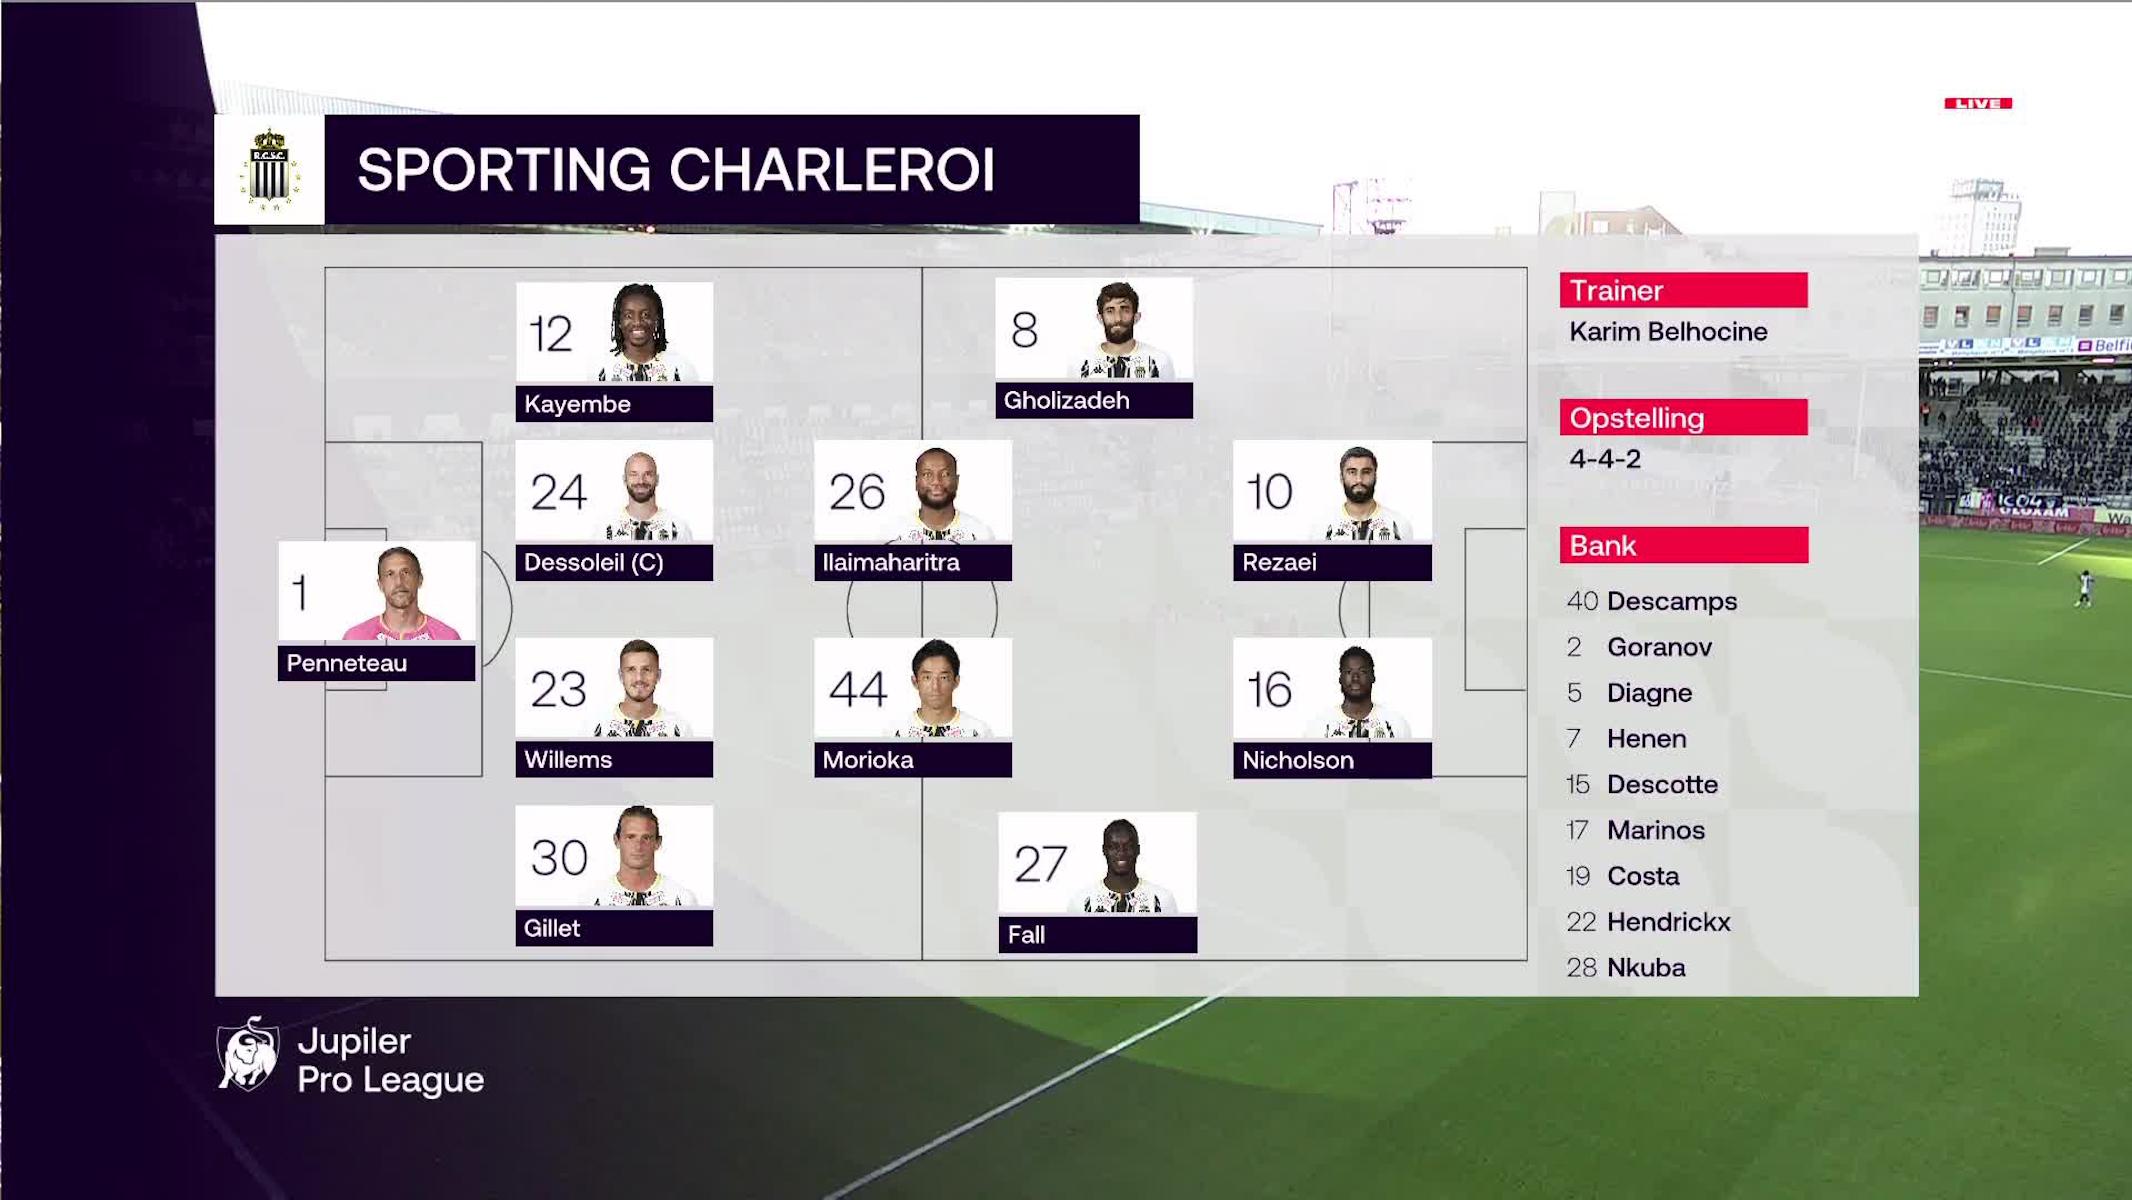 Samenvatting Sporting Charleroi vs. Standard de Liège